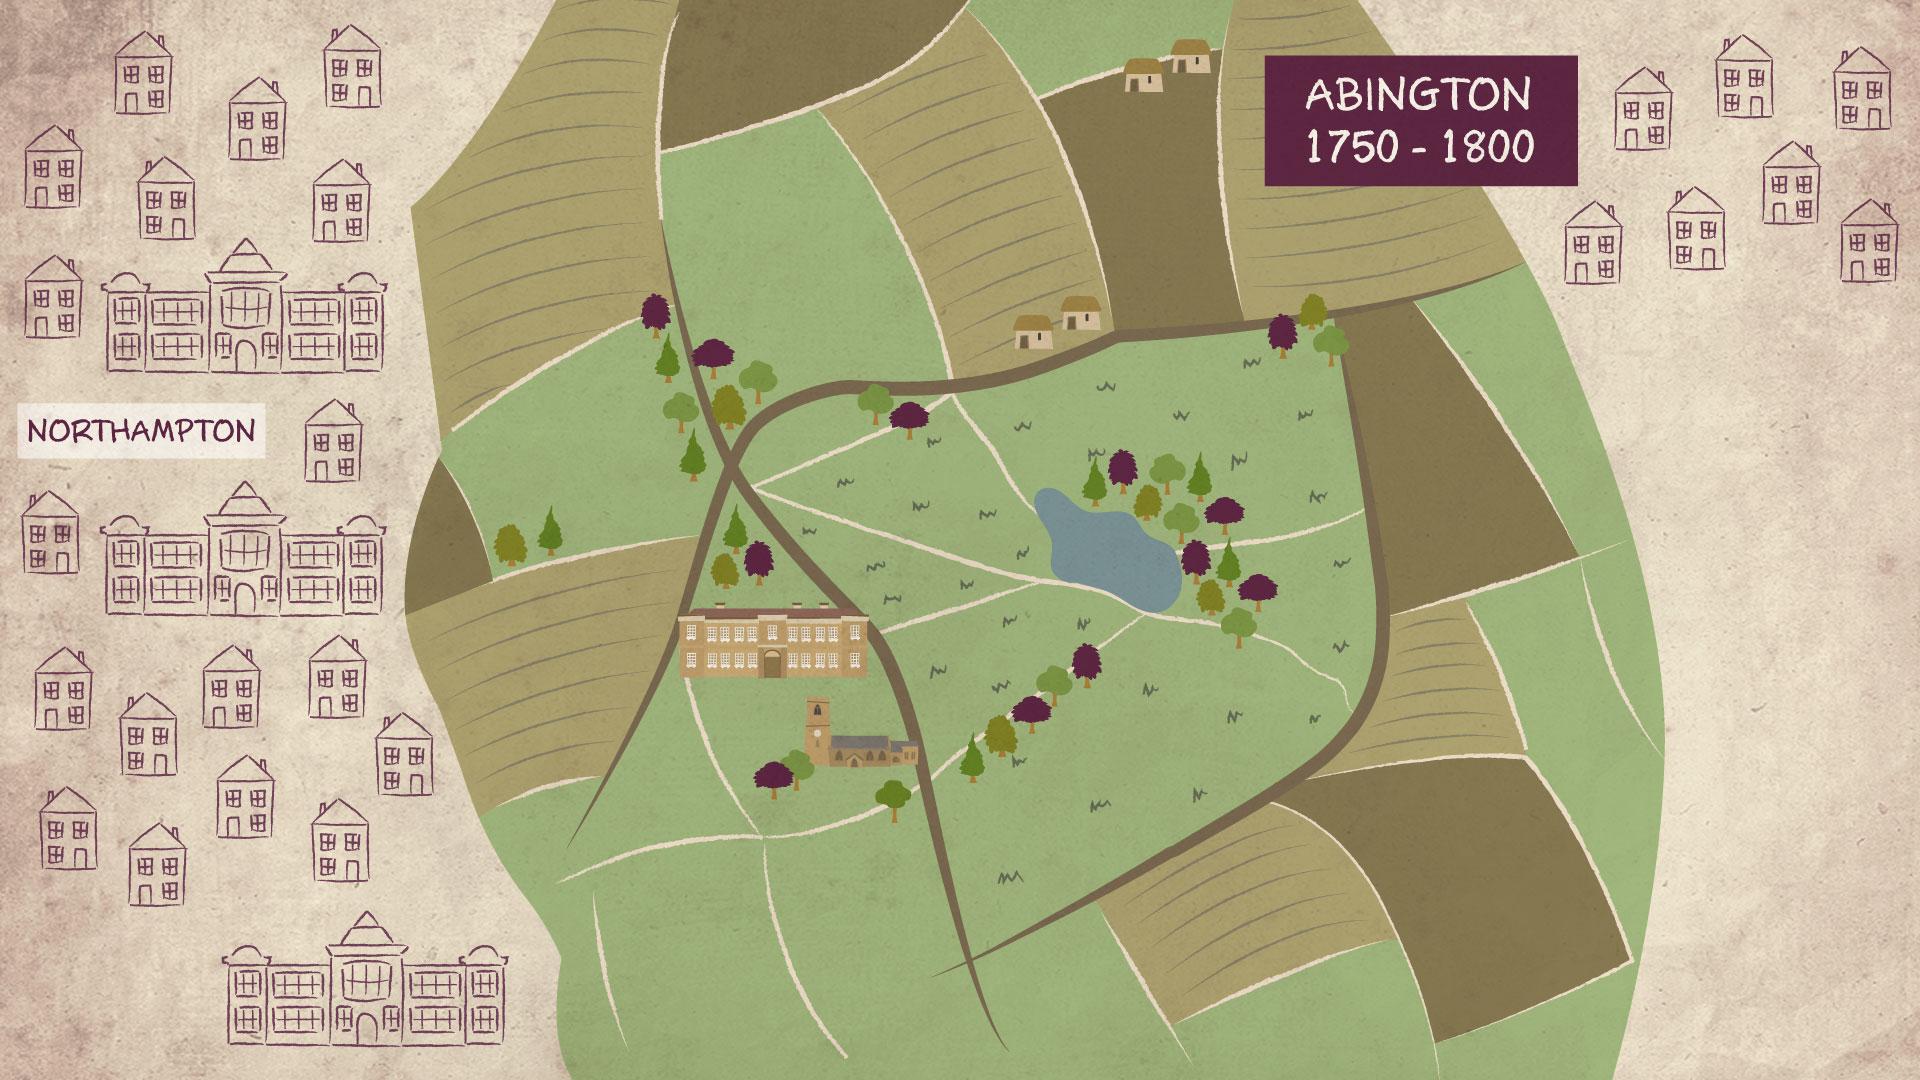 abington_northampton_map.jpg